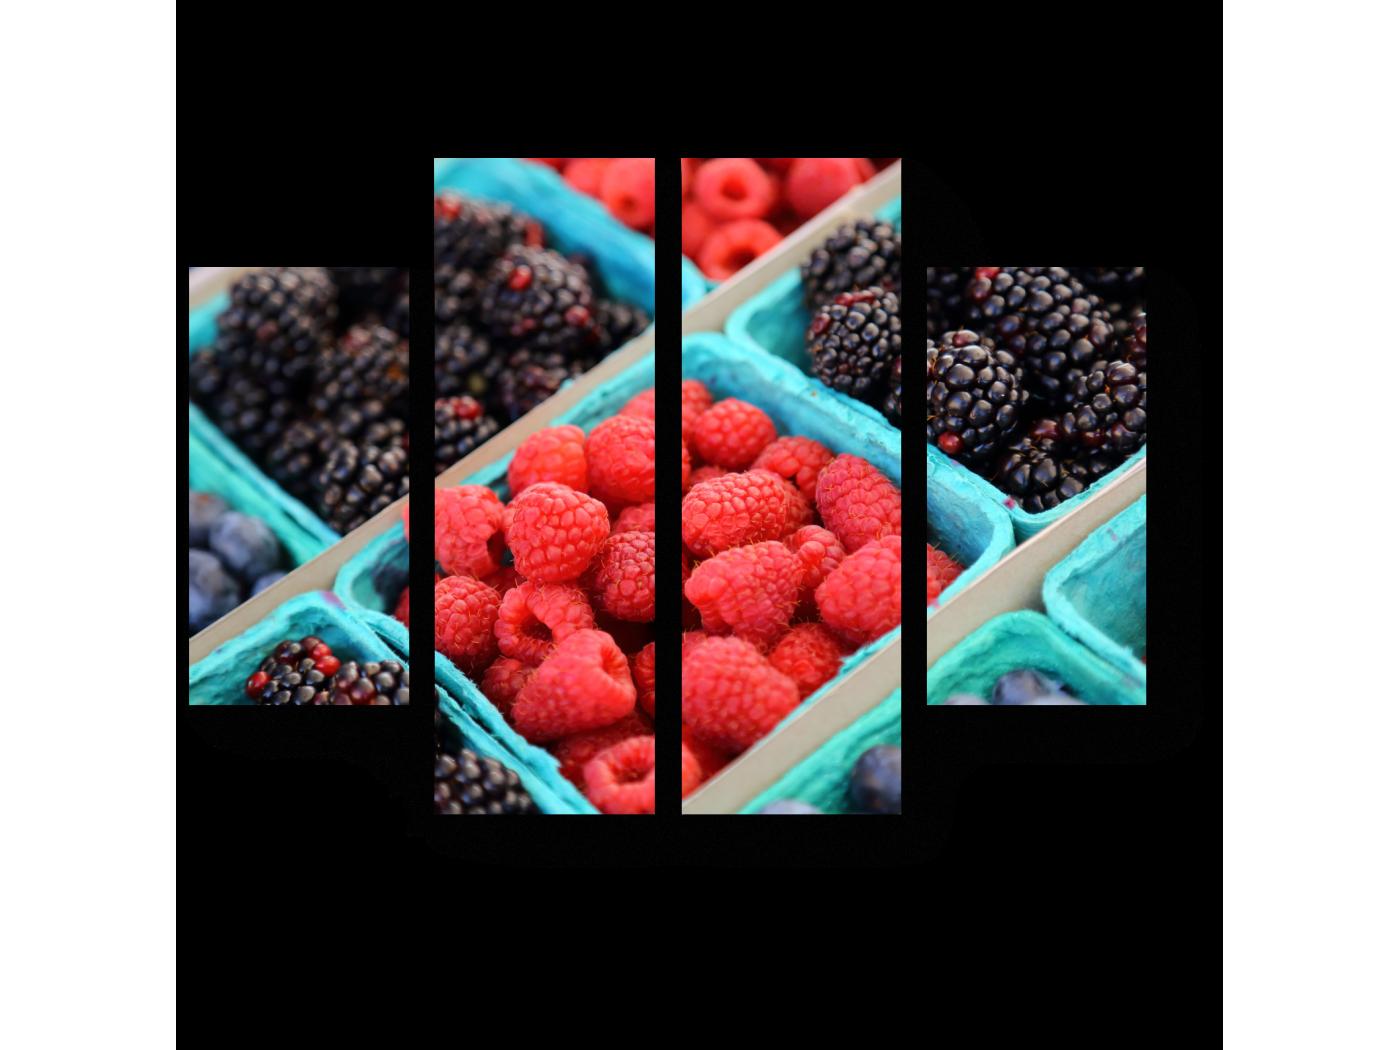 Модульная картина Летние лакомства (80x60) фото